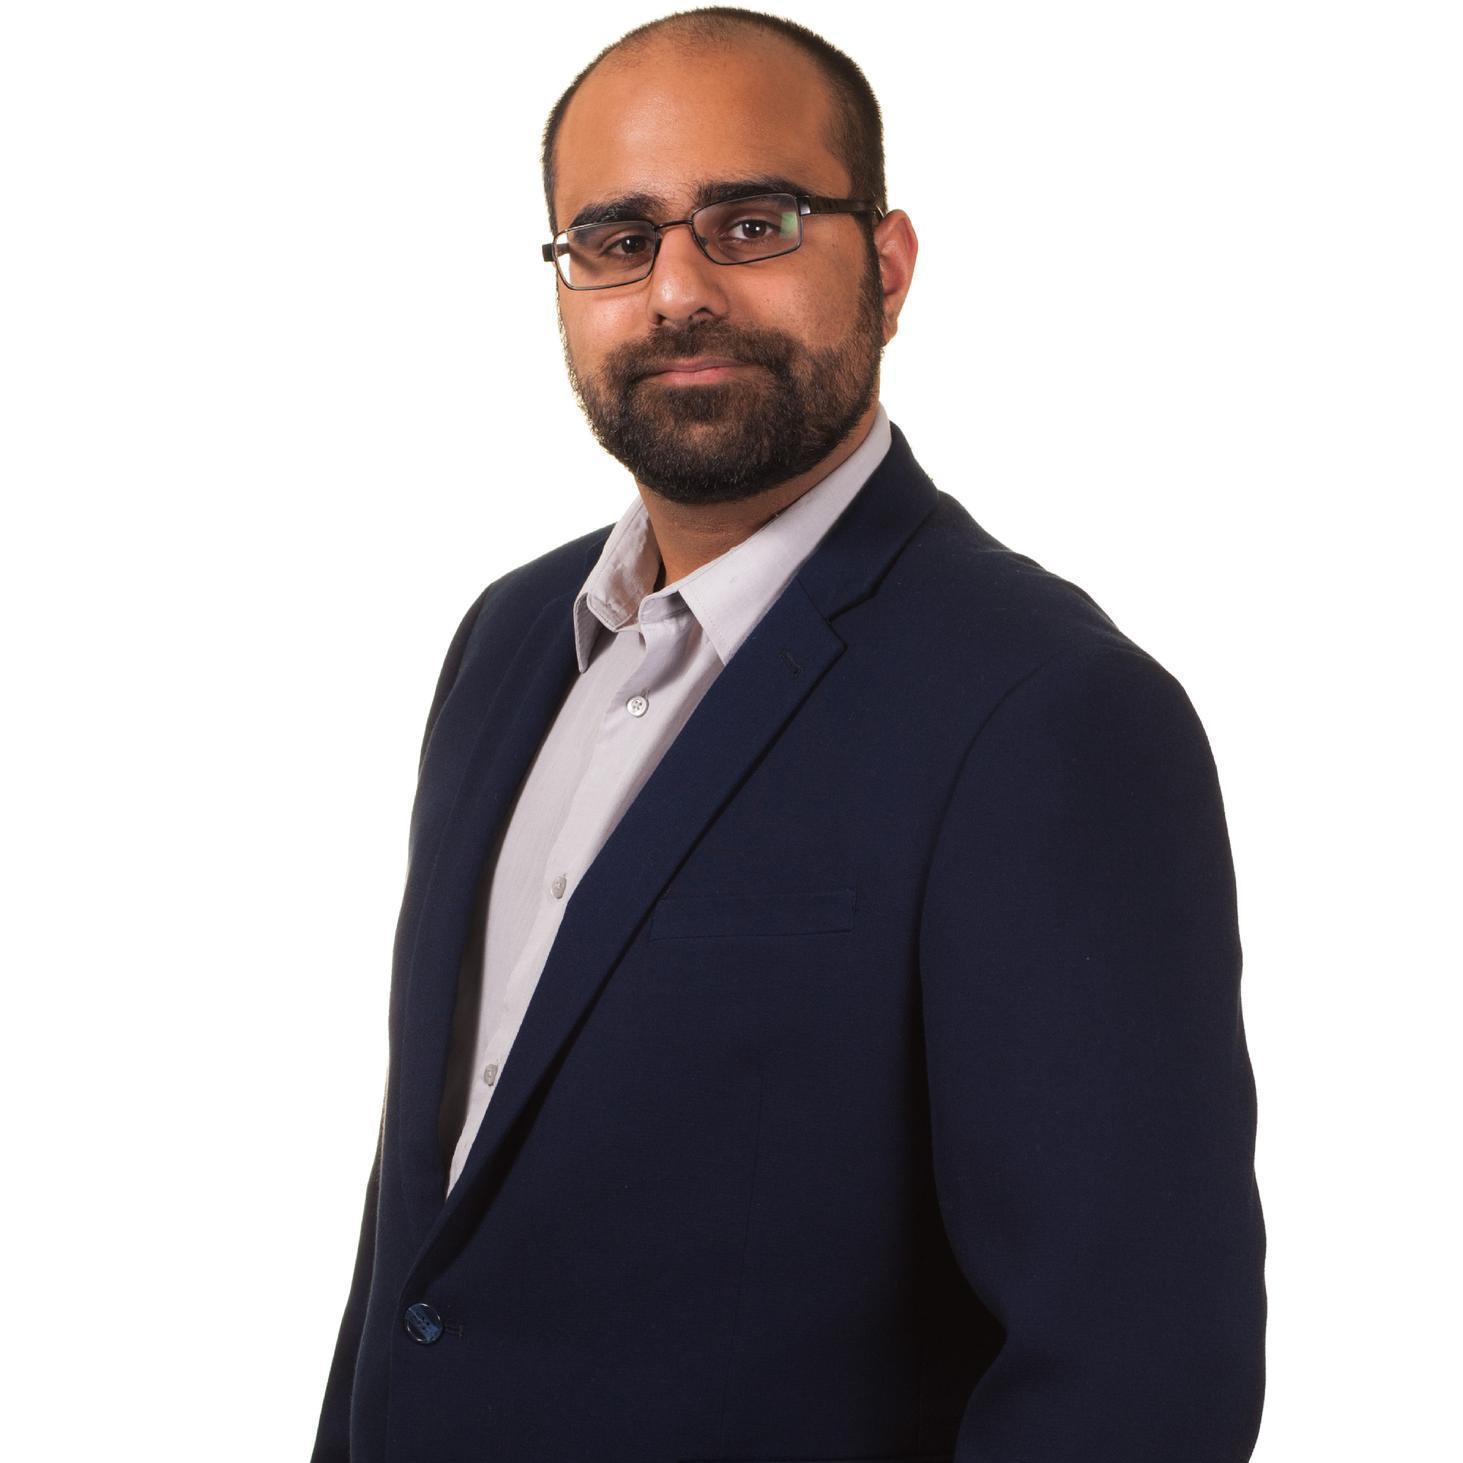 Hashim Yaqub